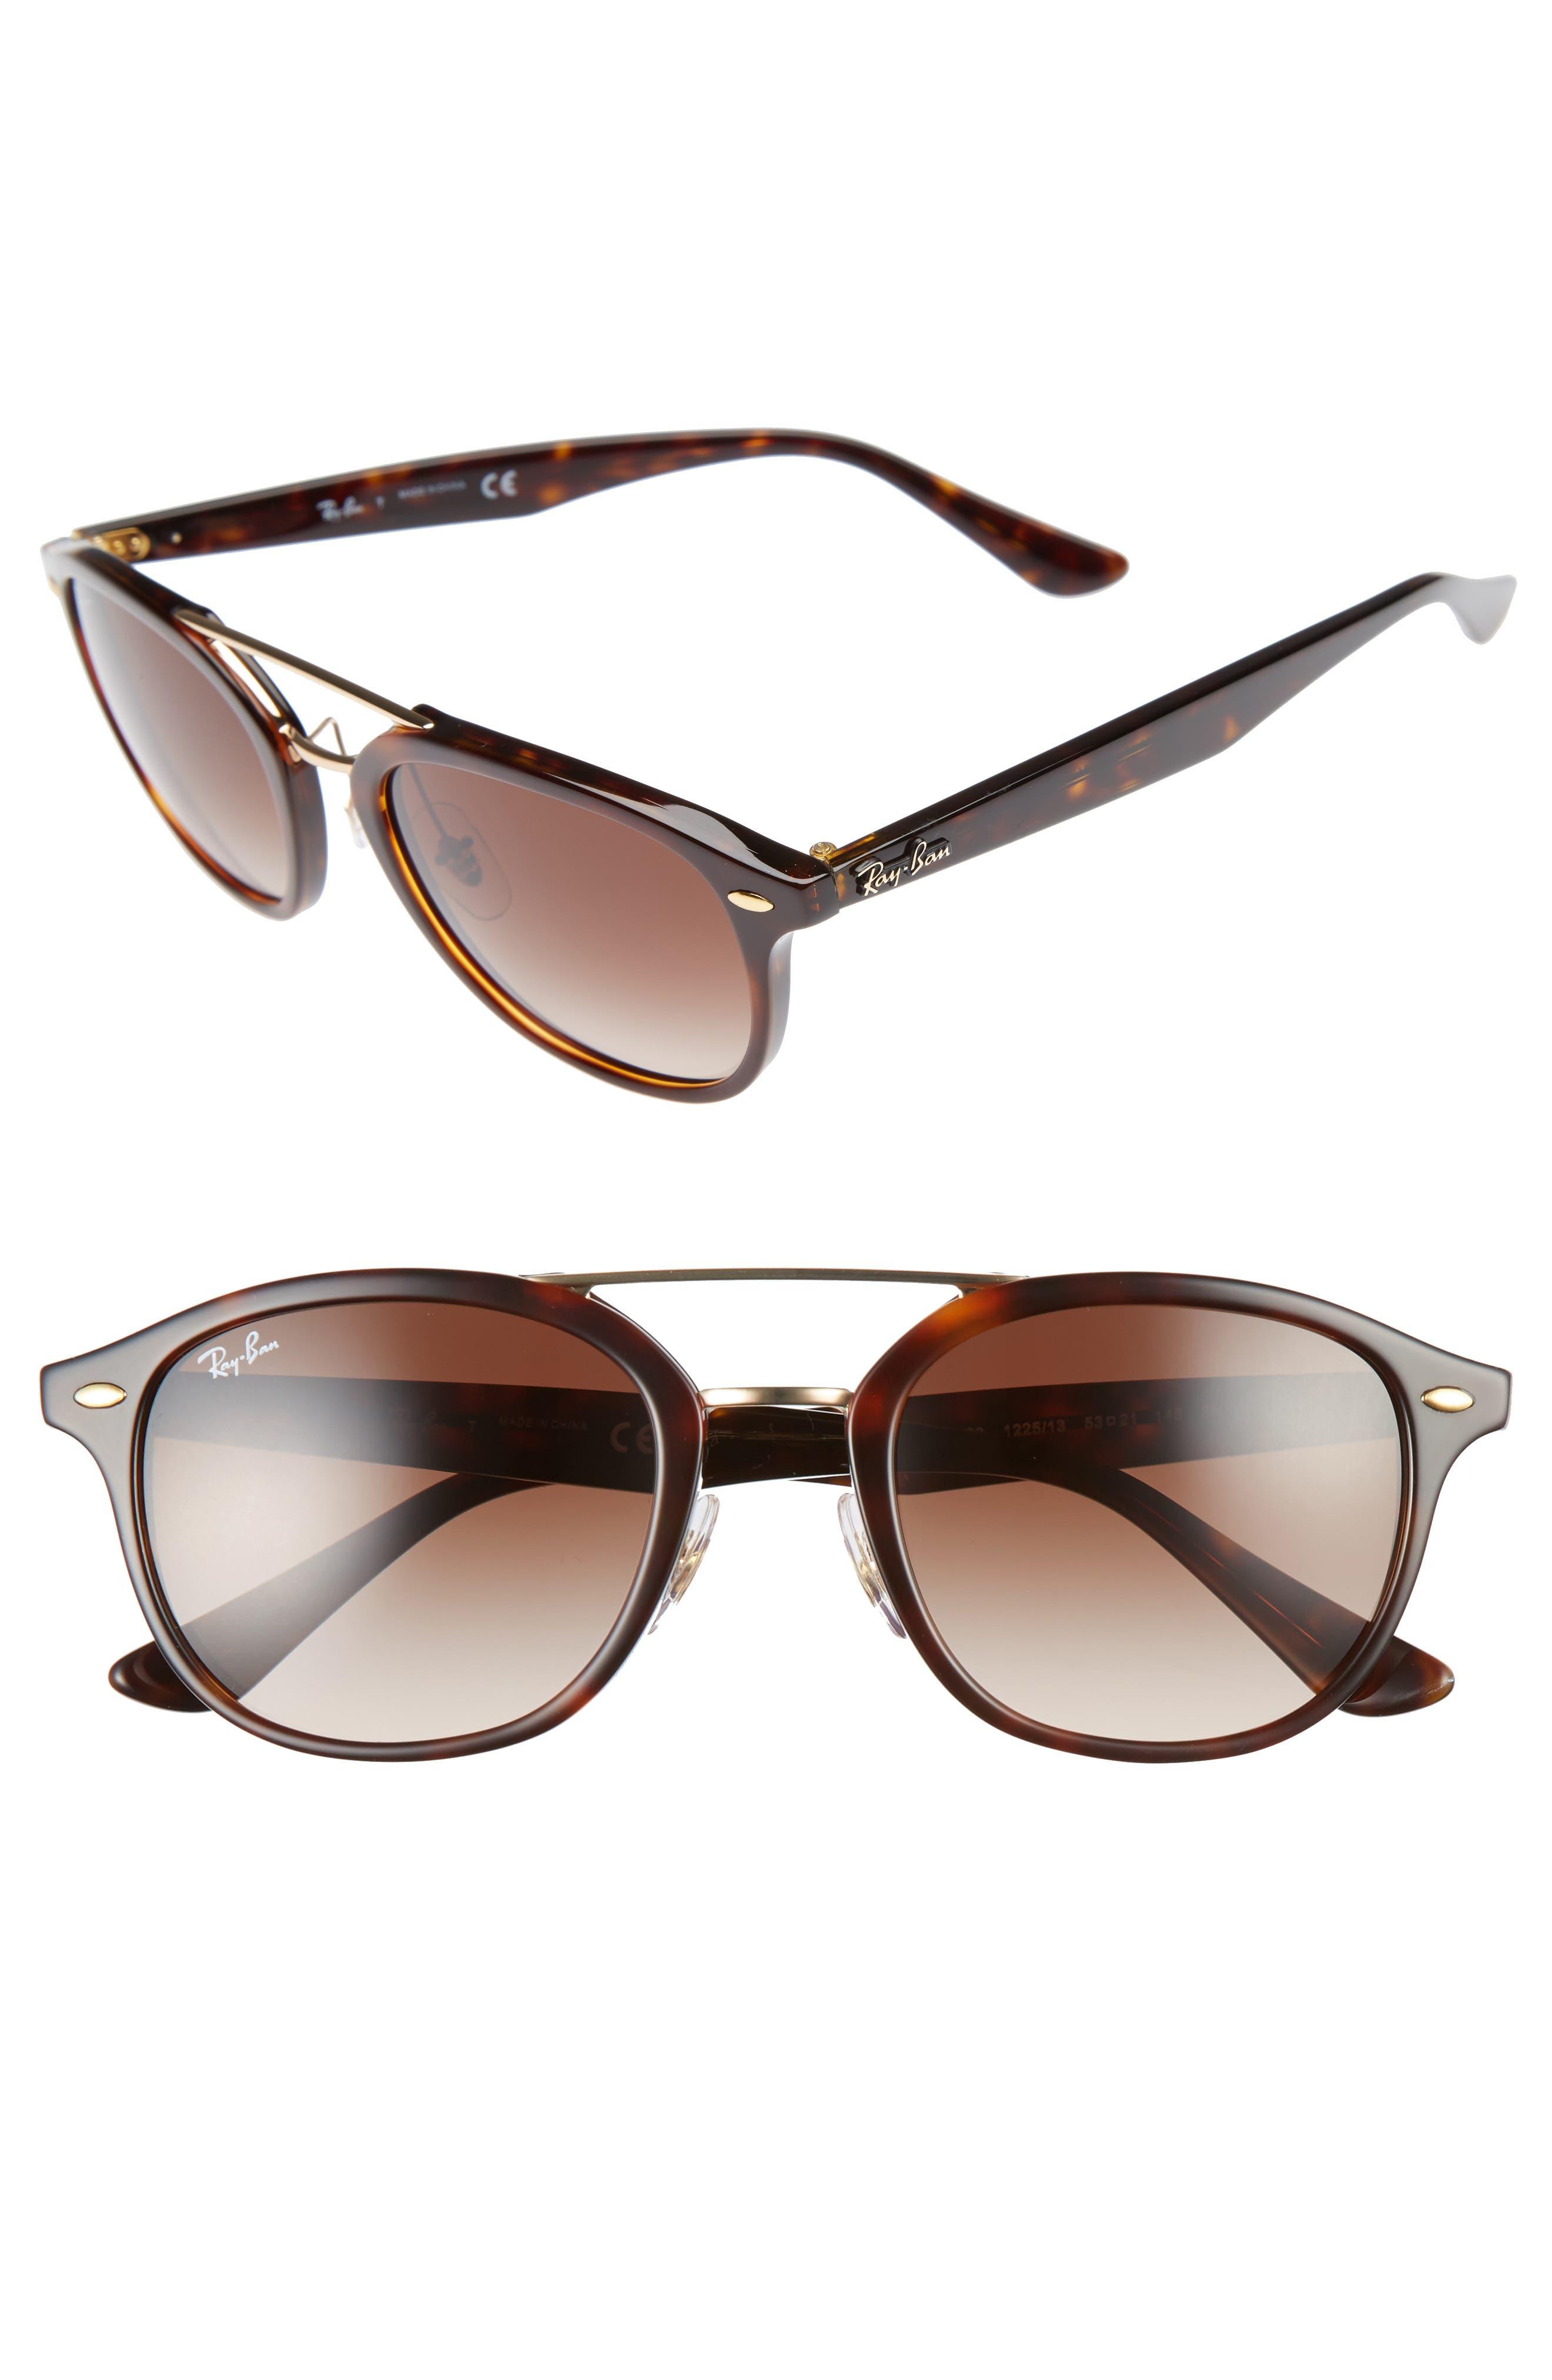 Highstreet 53mm Gradient Lens Sunglasses,                         Main,                         color, Brown Havana